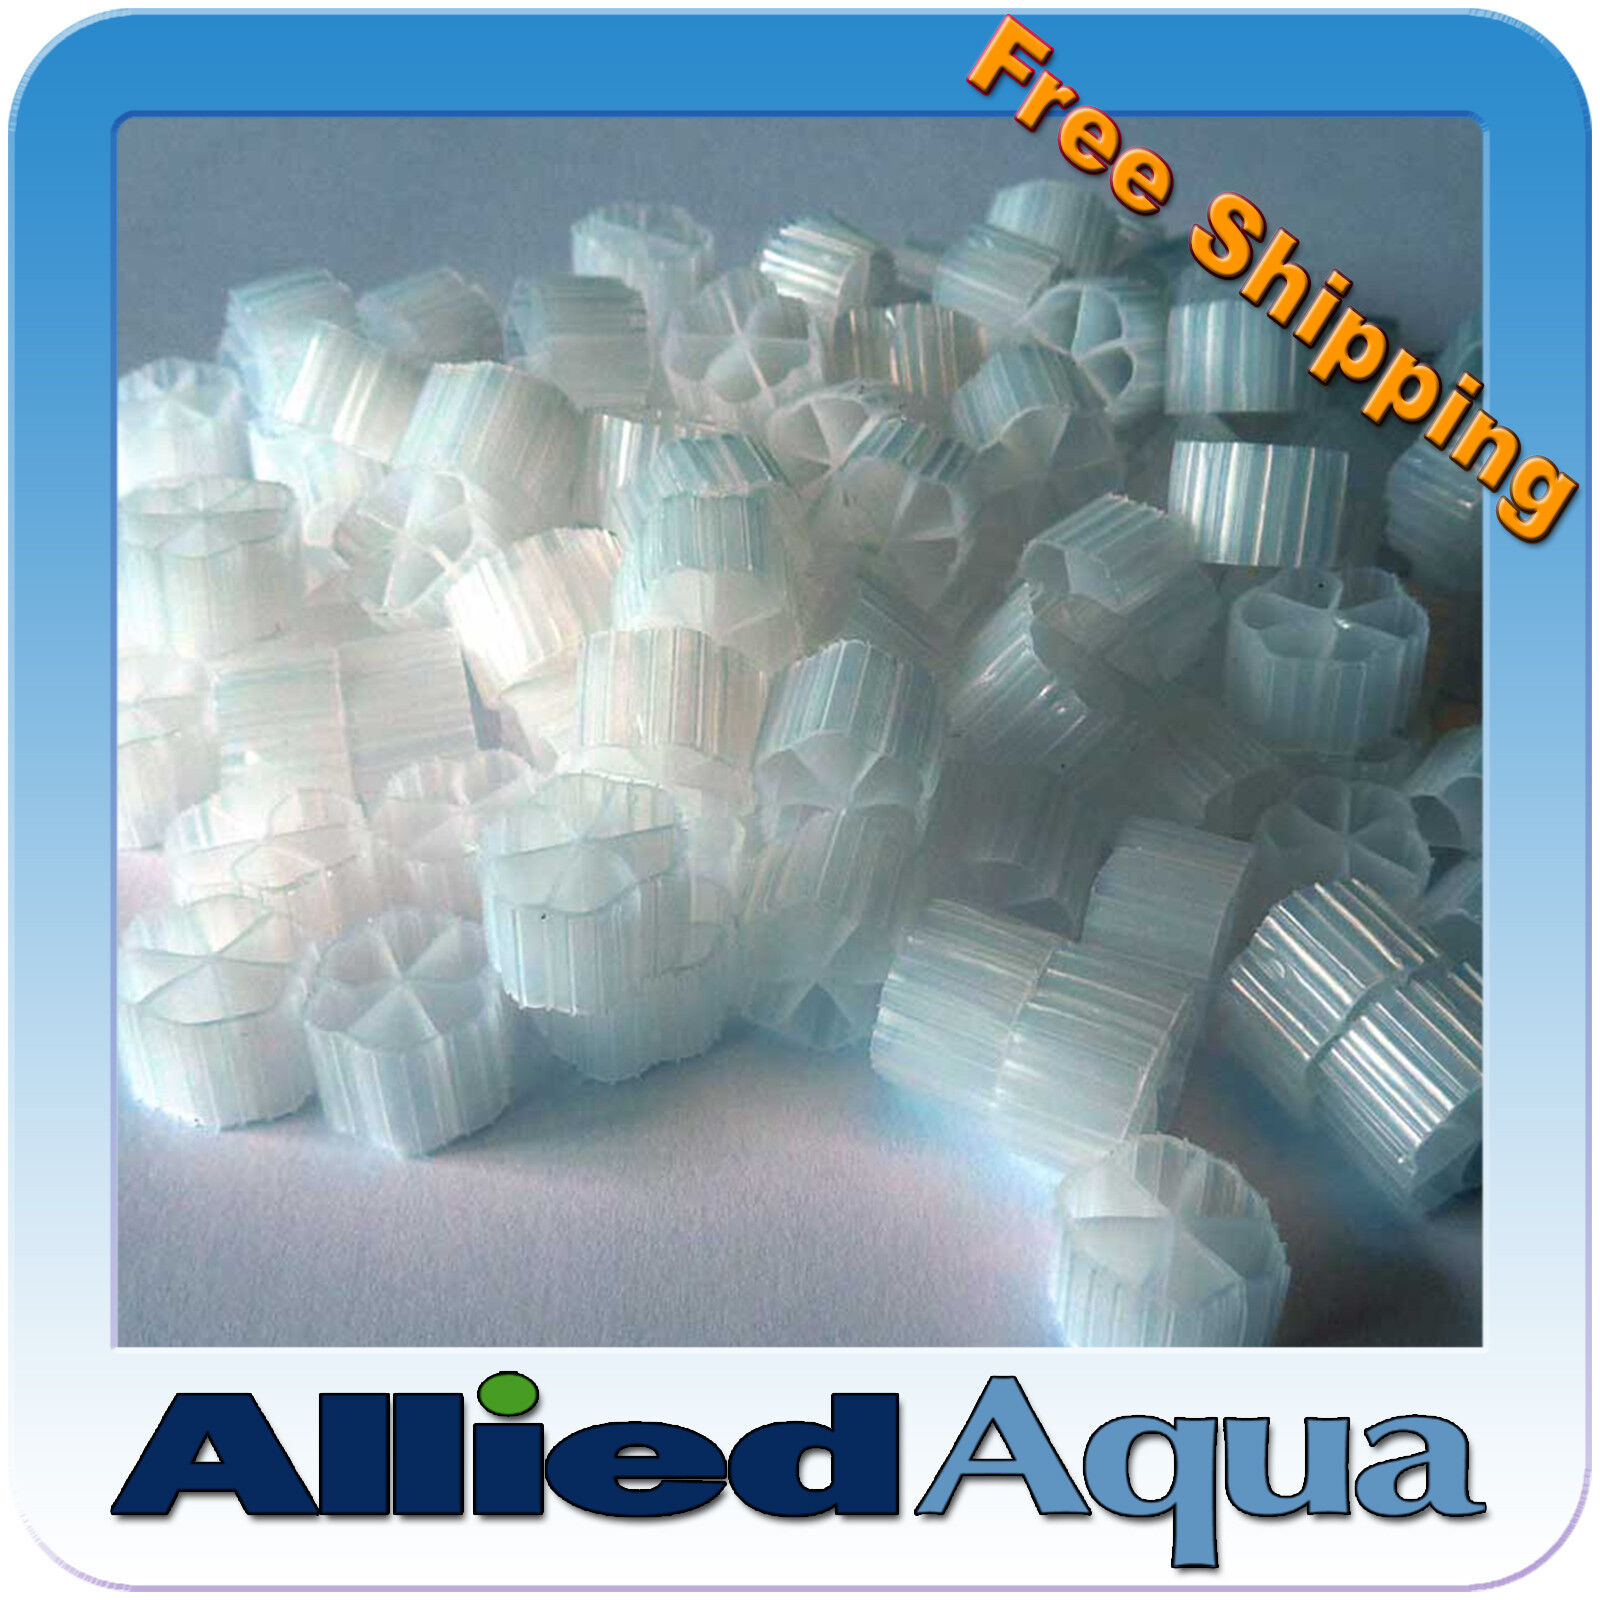 esclusivo Moving Bed Bio Filter Filter Filter Media MBBR 1 Cubic Foot, Better than Kaldnes K1 aquaponics  ultimi stili